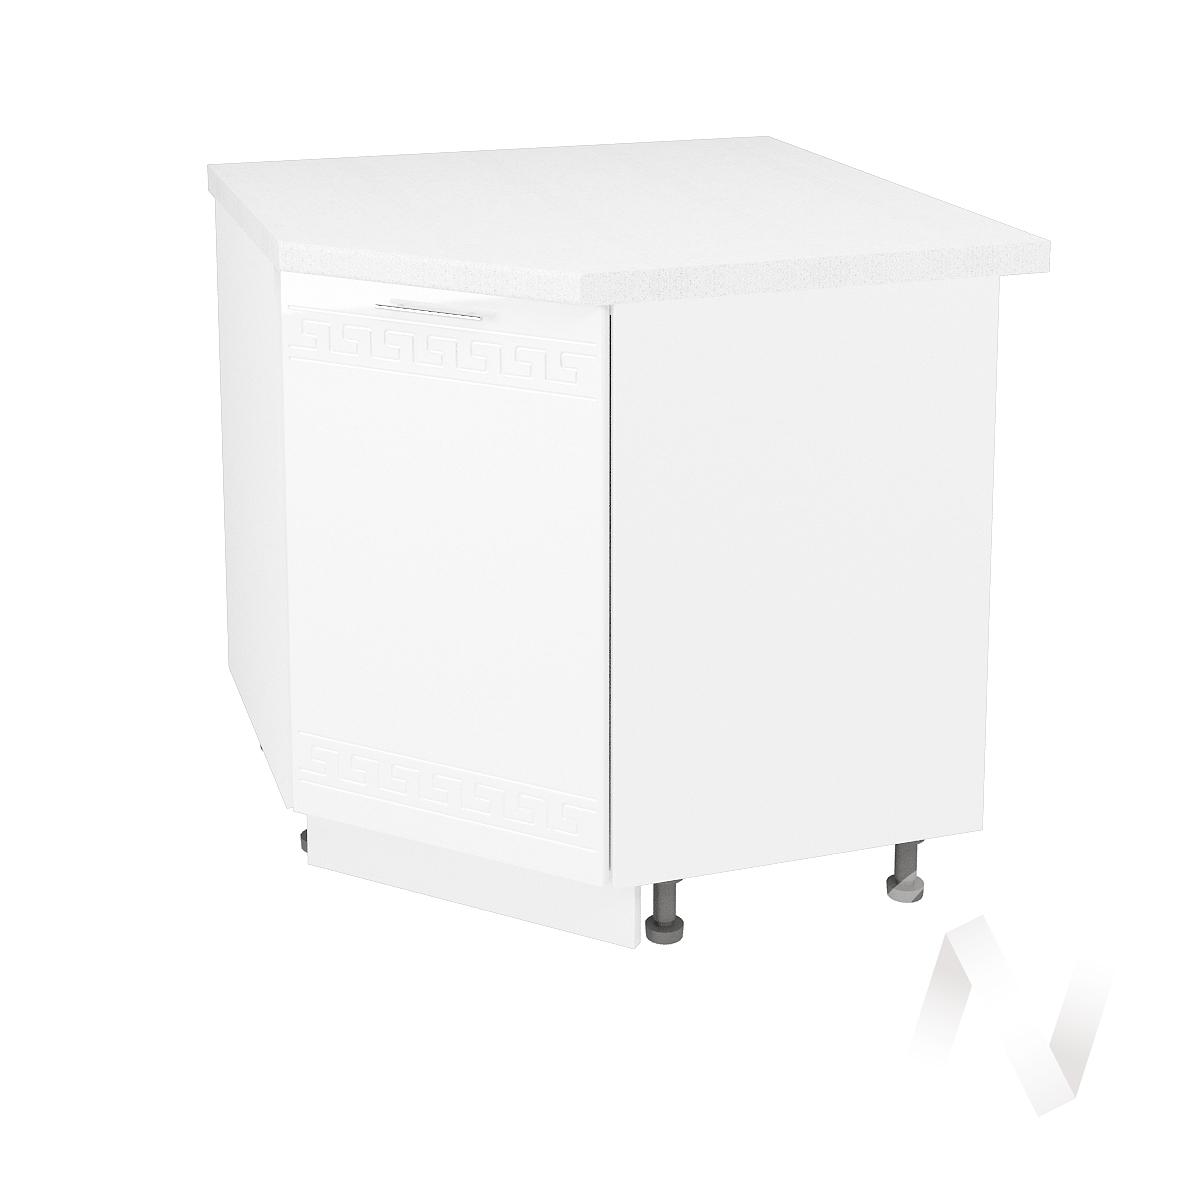 "Кухня ""Греция"": Шкаф нижний угловой 890, ШНУ 890 (белый металлик/корпус белый)"